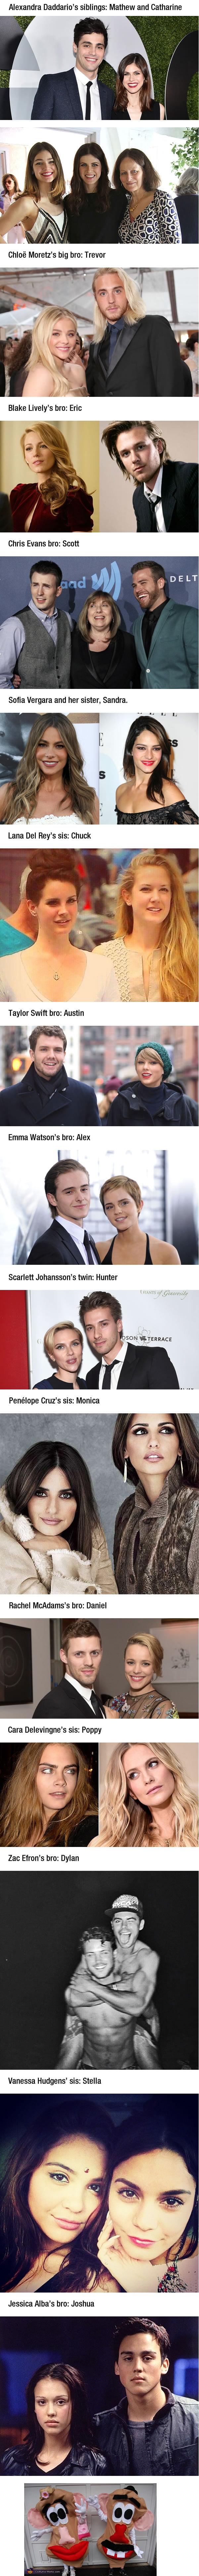 Celebrities with hot siblings